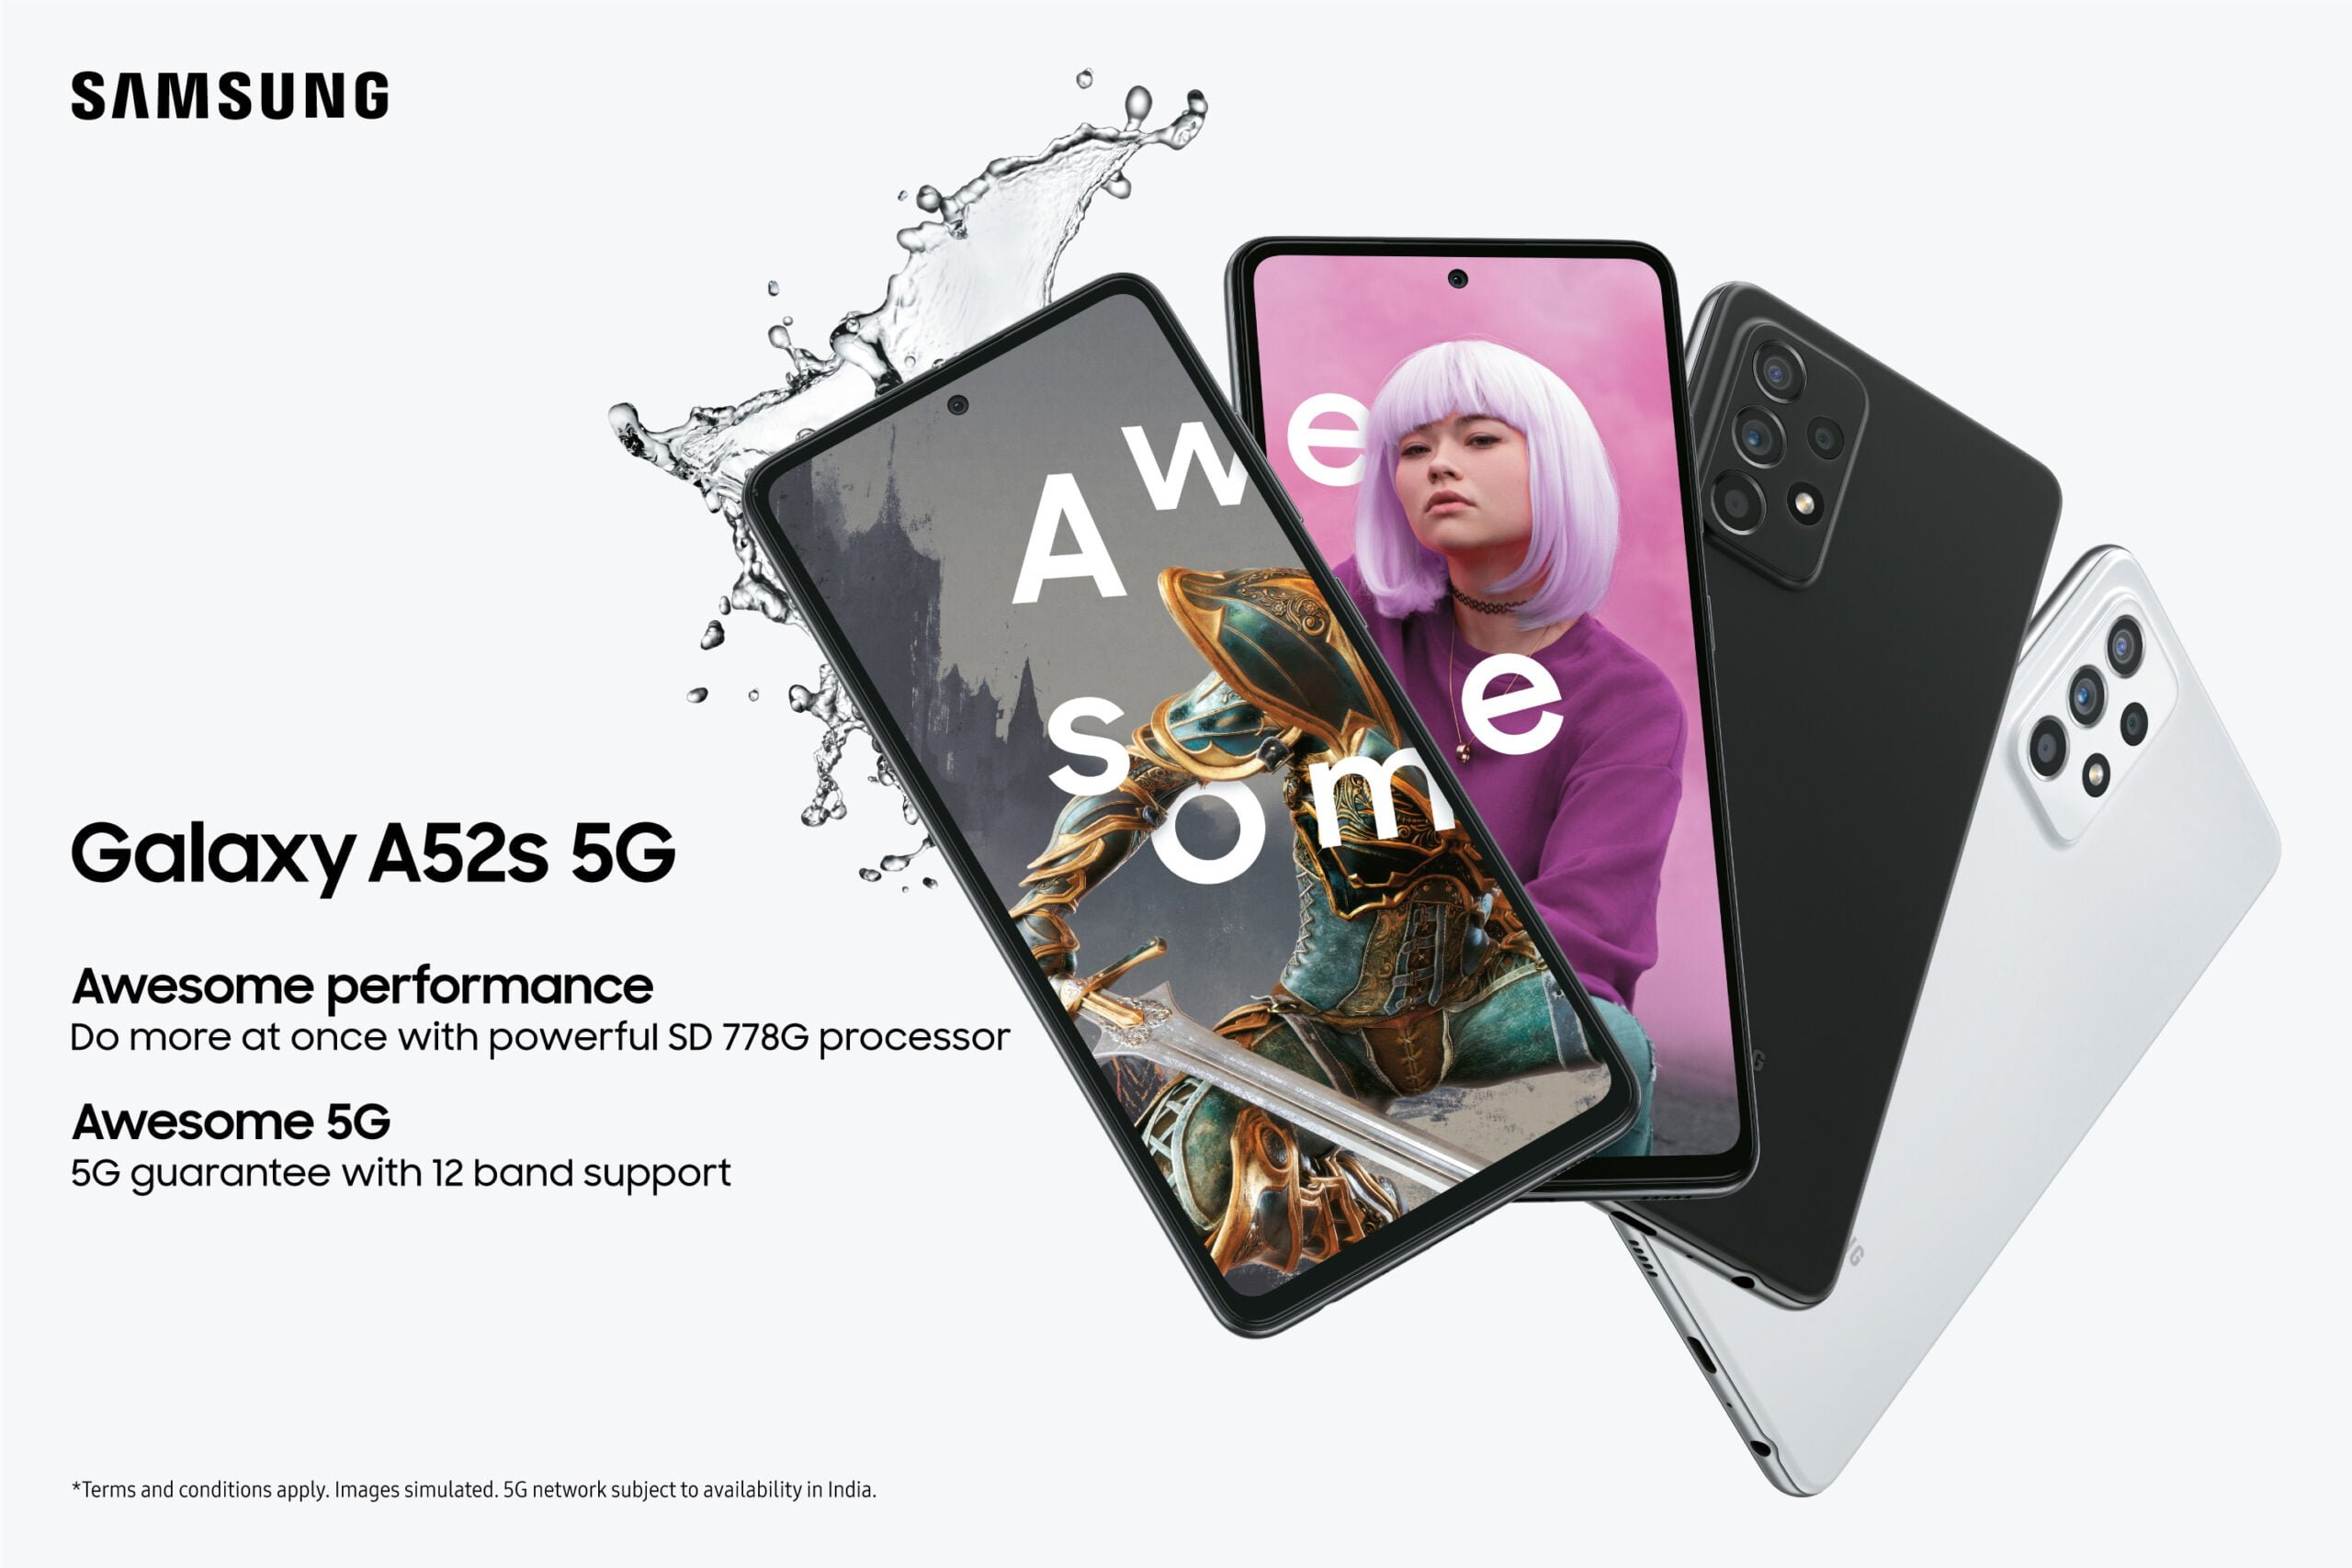 Galaxy A52s 5G scaled